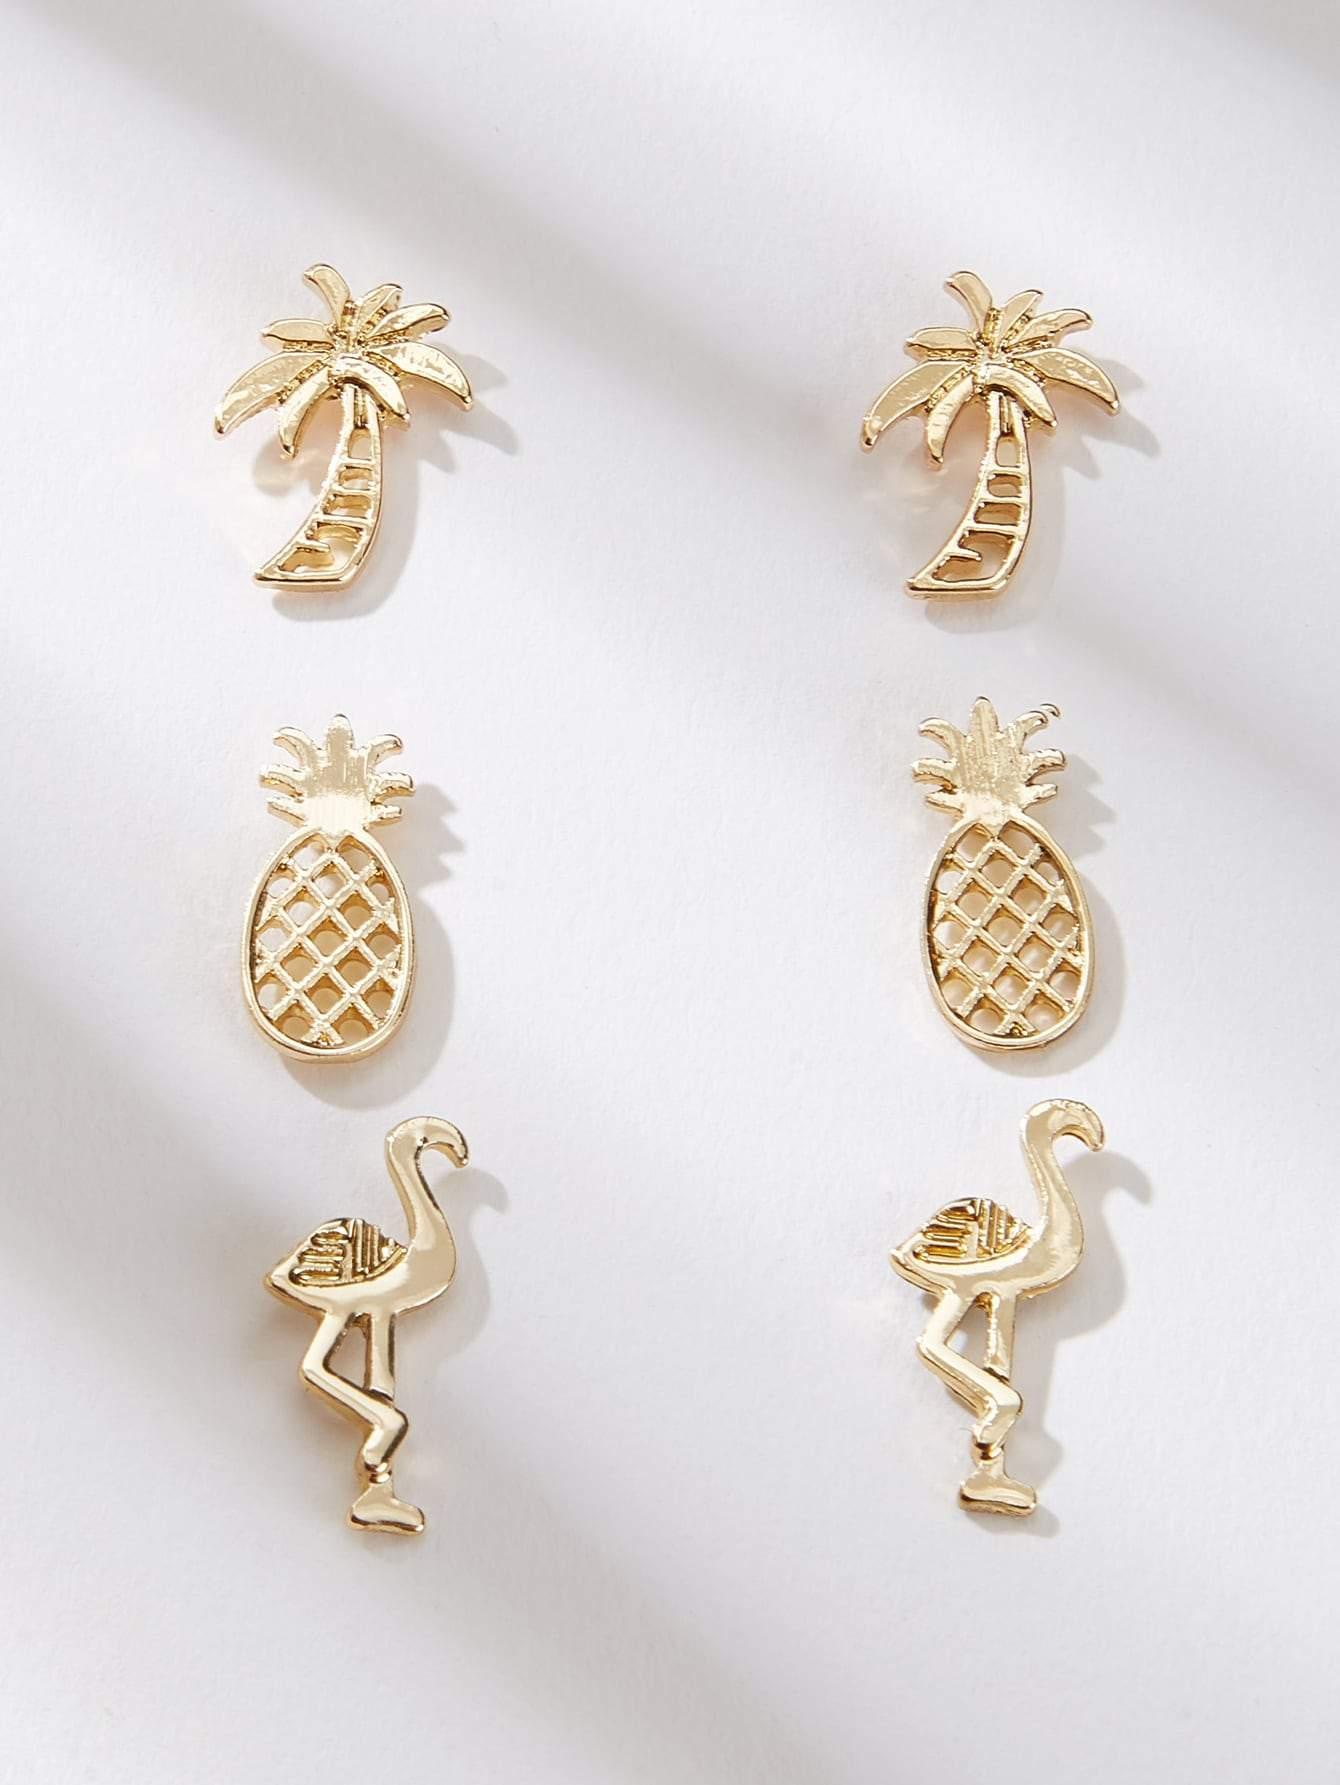 Pineapple Aretes Pendientes Oro O Plata Stud Earring